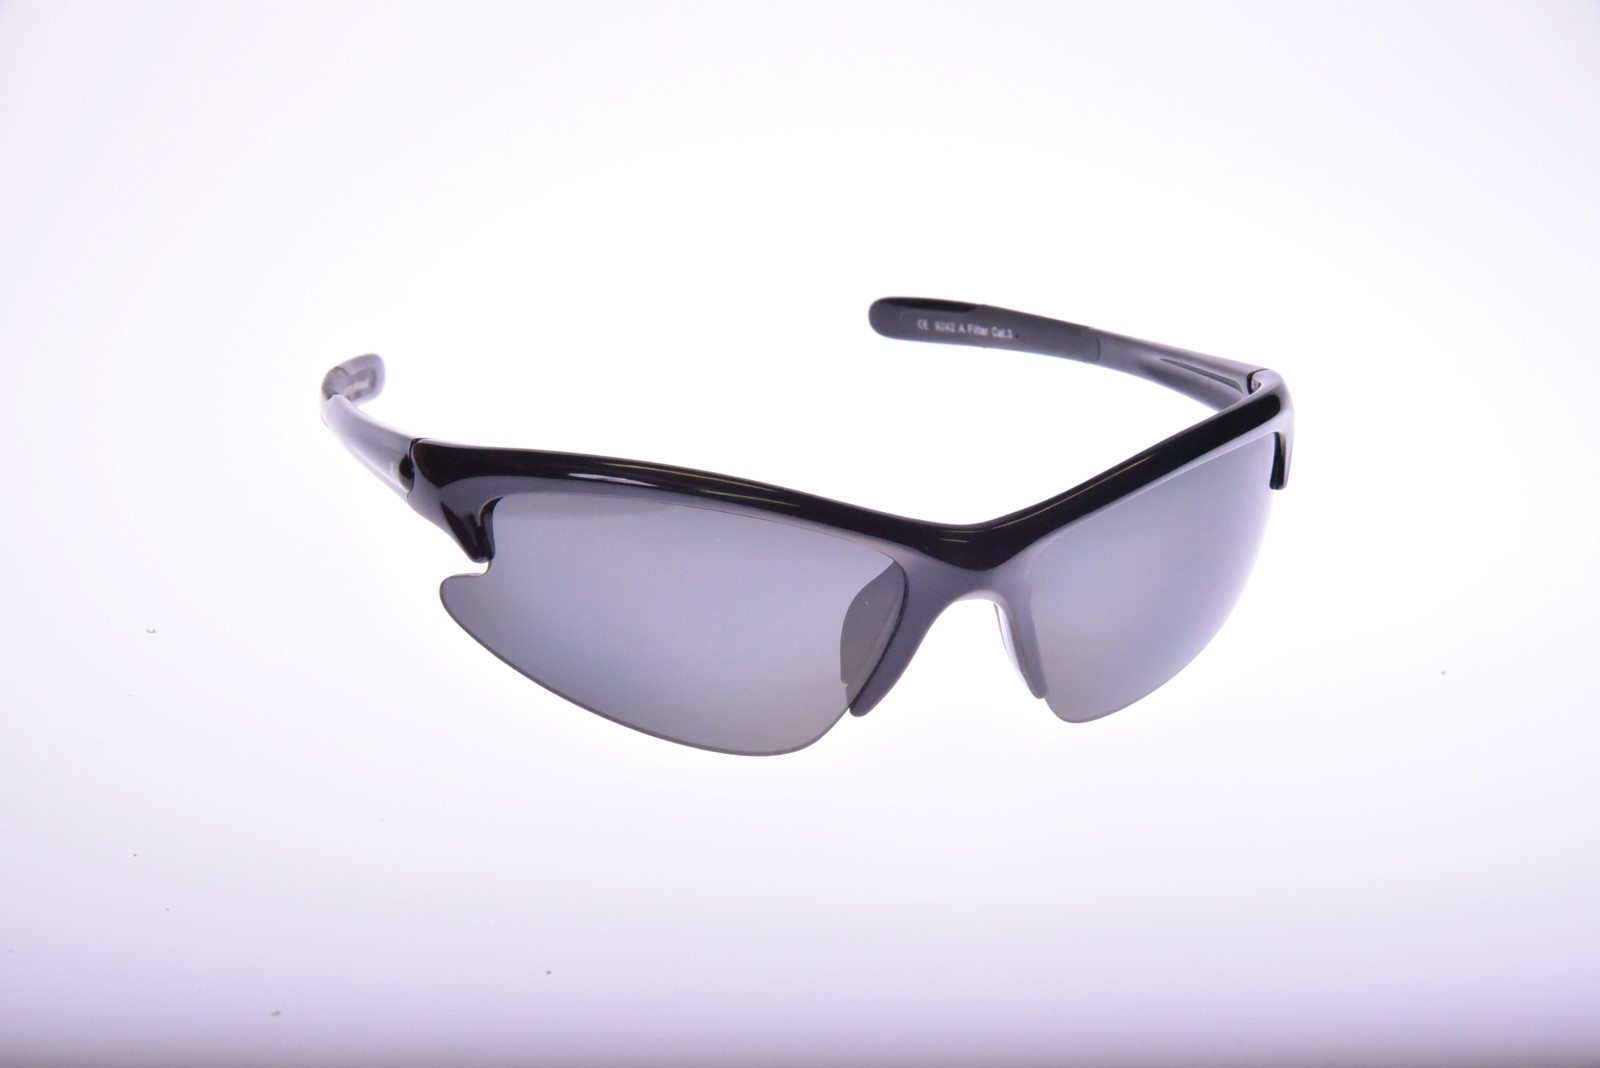 Polaroid Sport 9242A - Unisex slnečné okuliare a6c9421fdd6